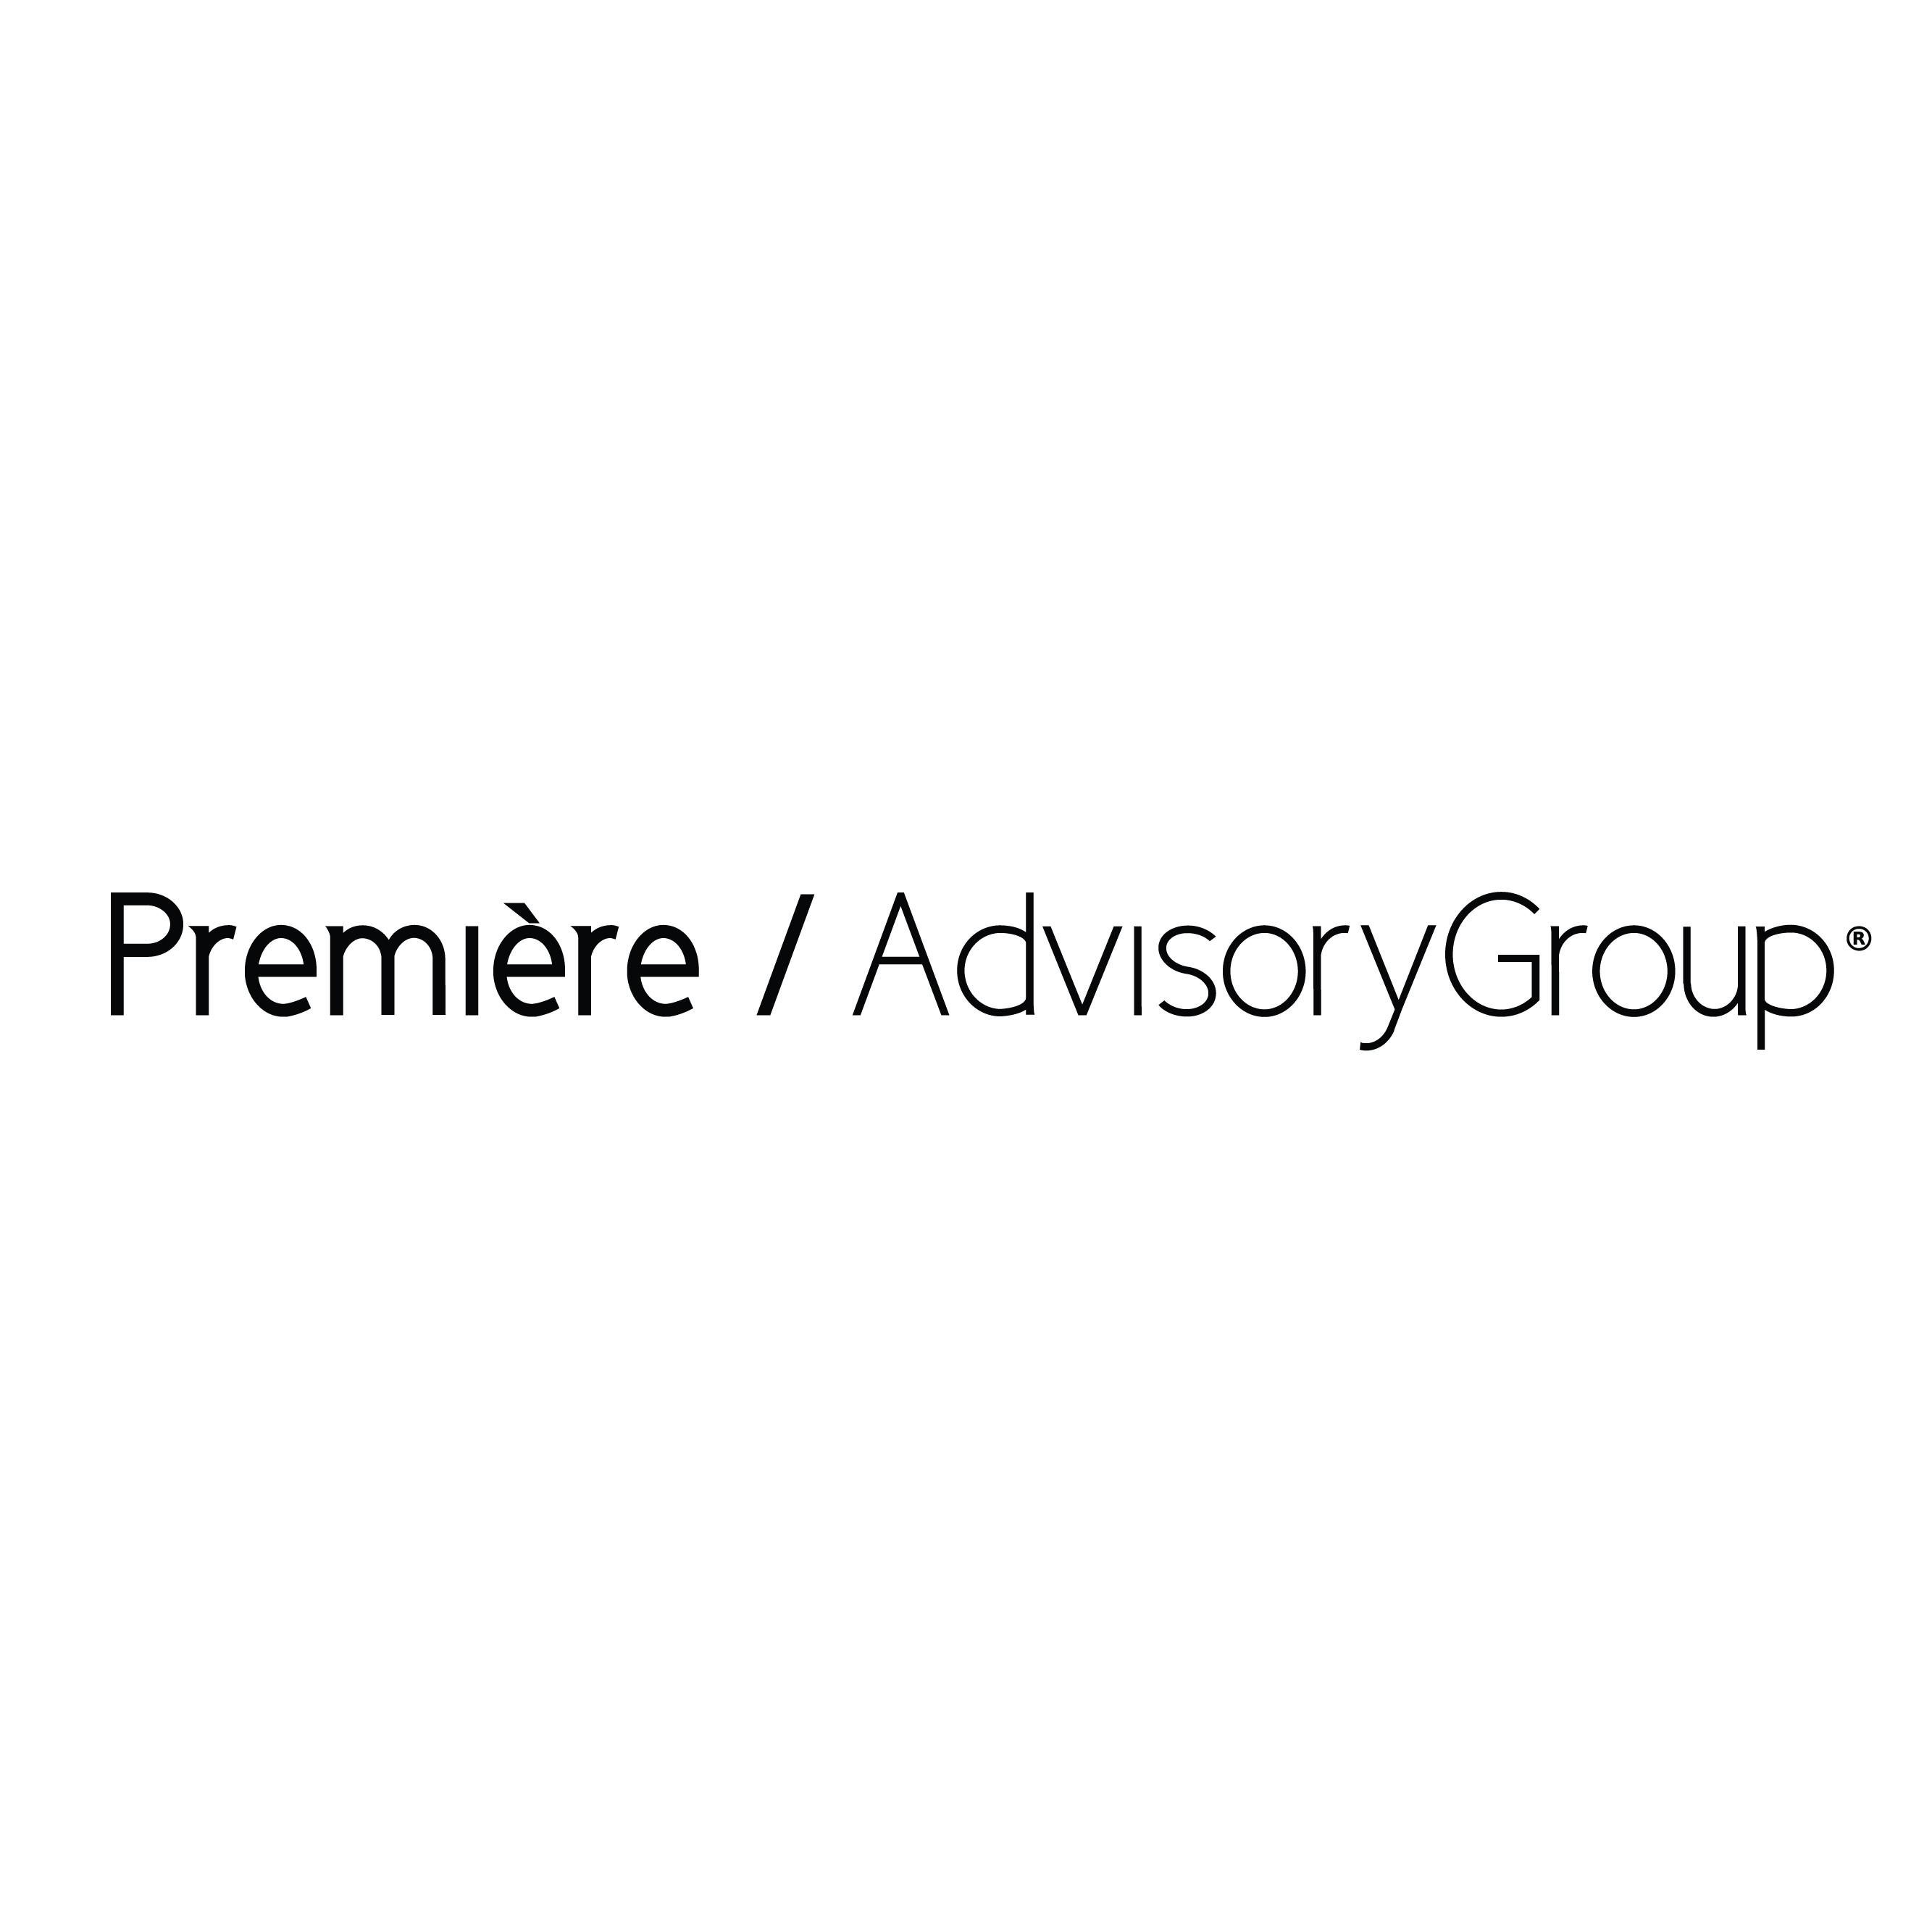 Premiere Advisory Group